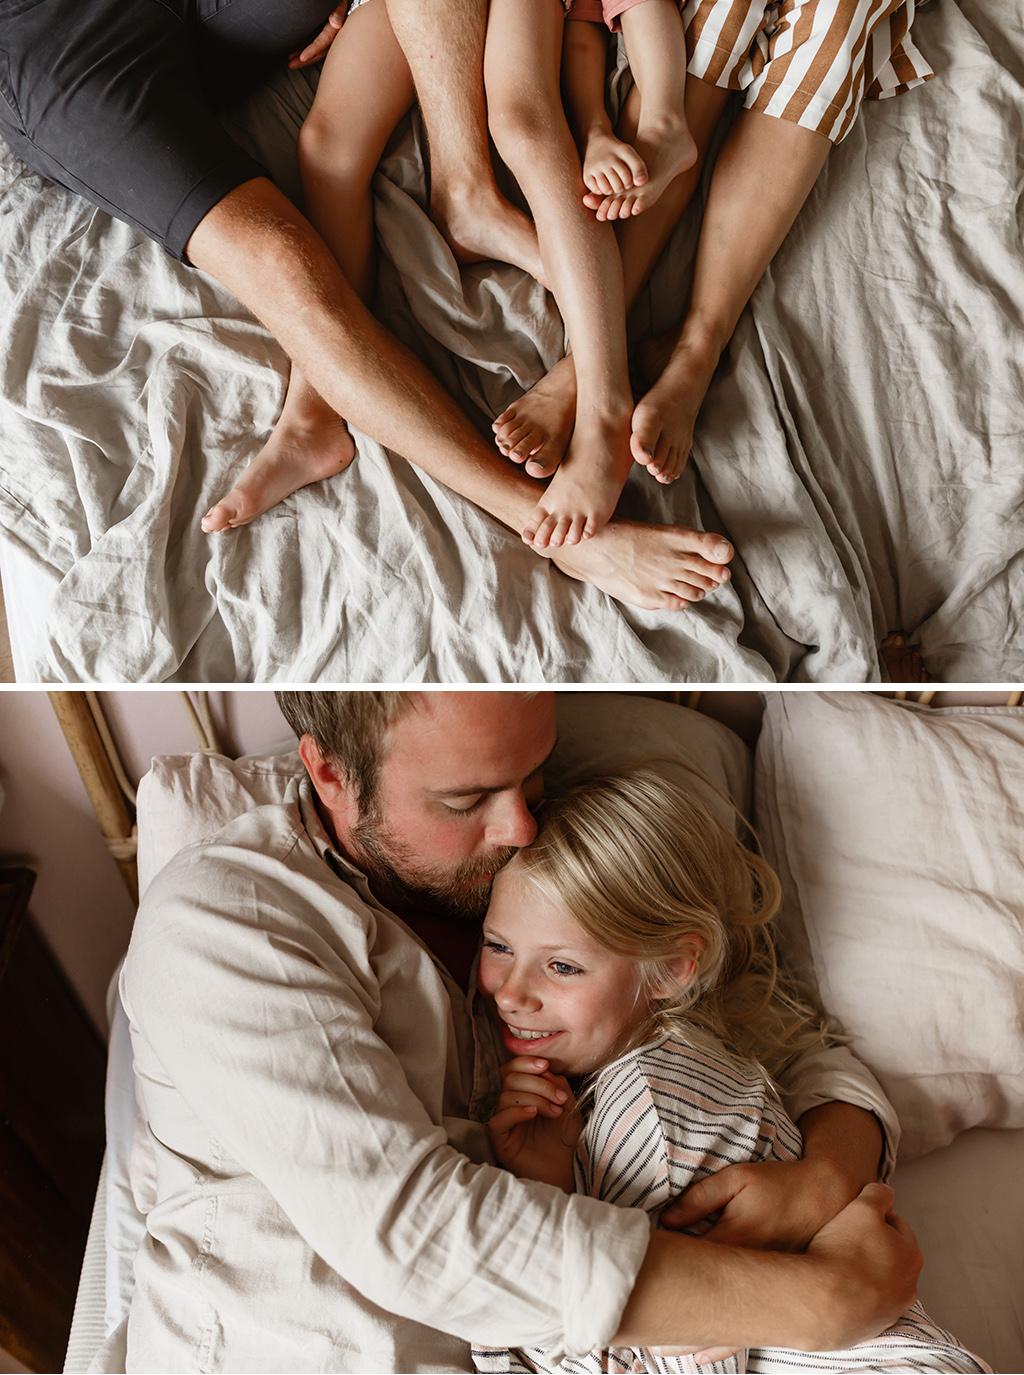 Lifestyle_familjefotografering_Stockholm_hemma-hos-fotografering_lifestyle-inhome-session_1.jpg